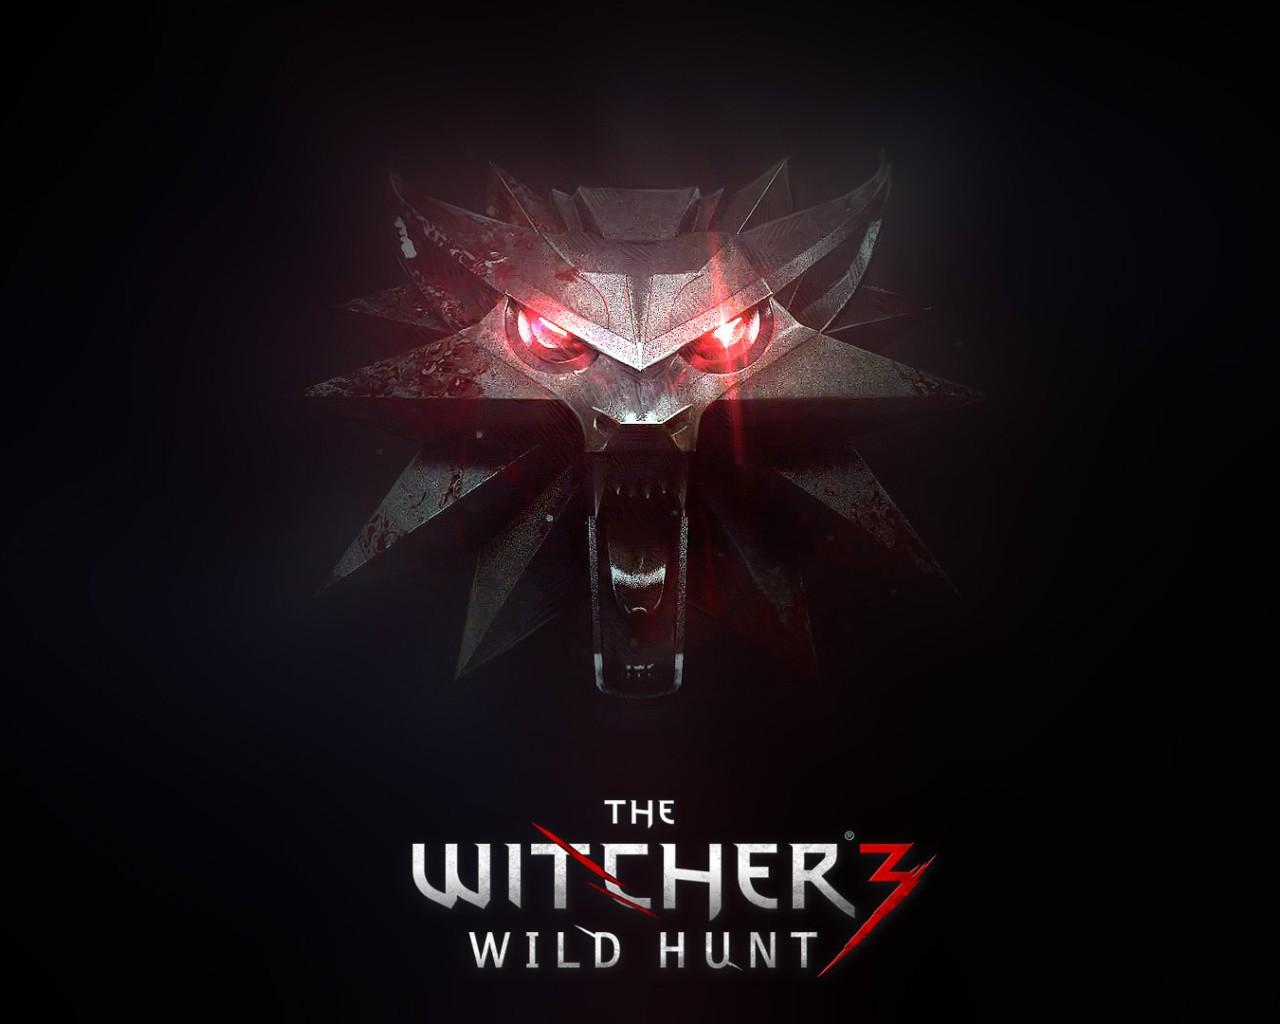 [Обзор] The Witcher 3: Wild Hunt — превью игры